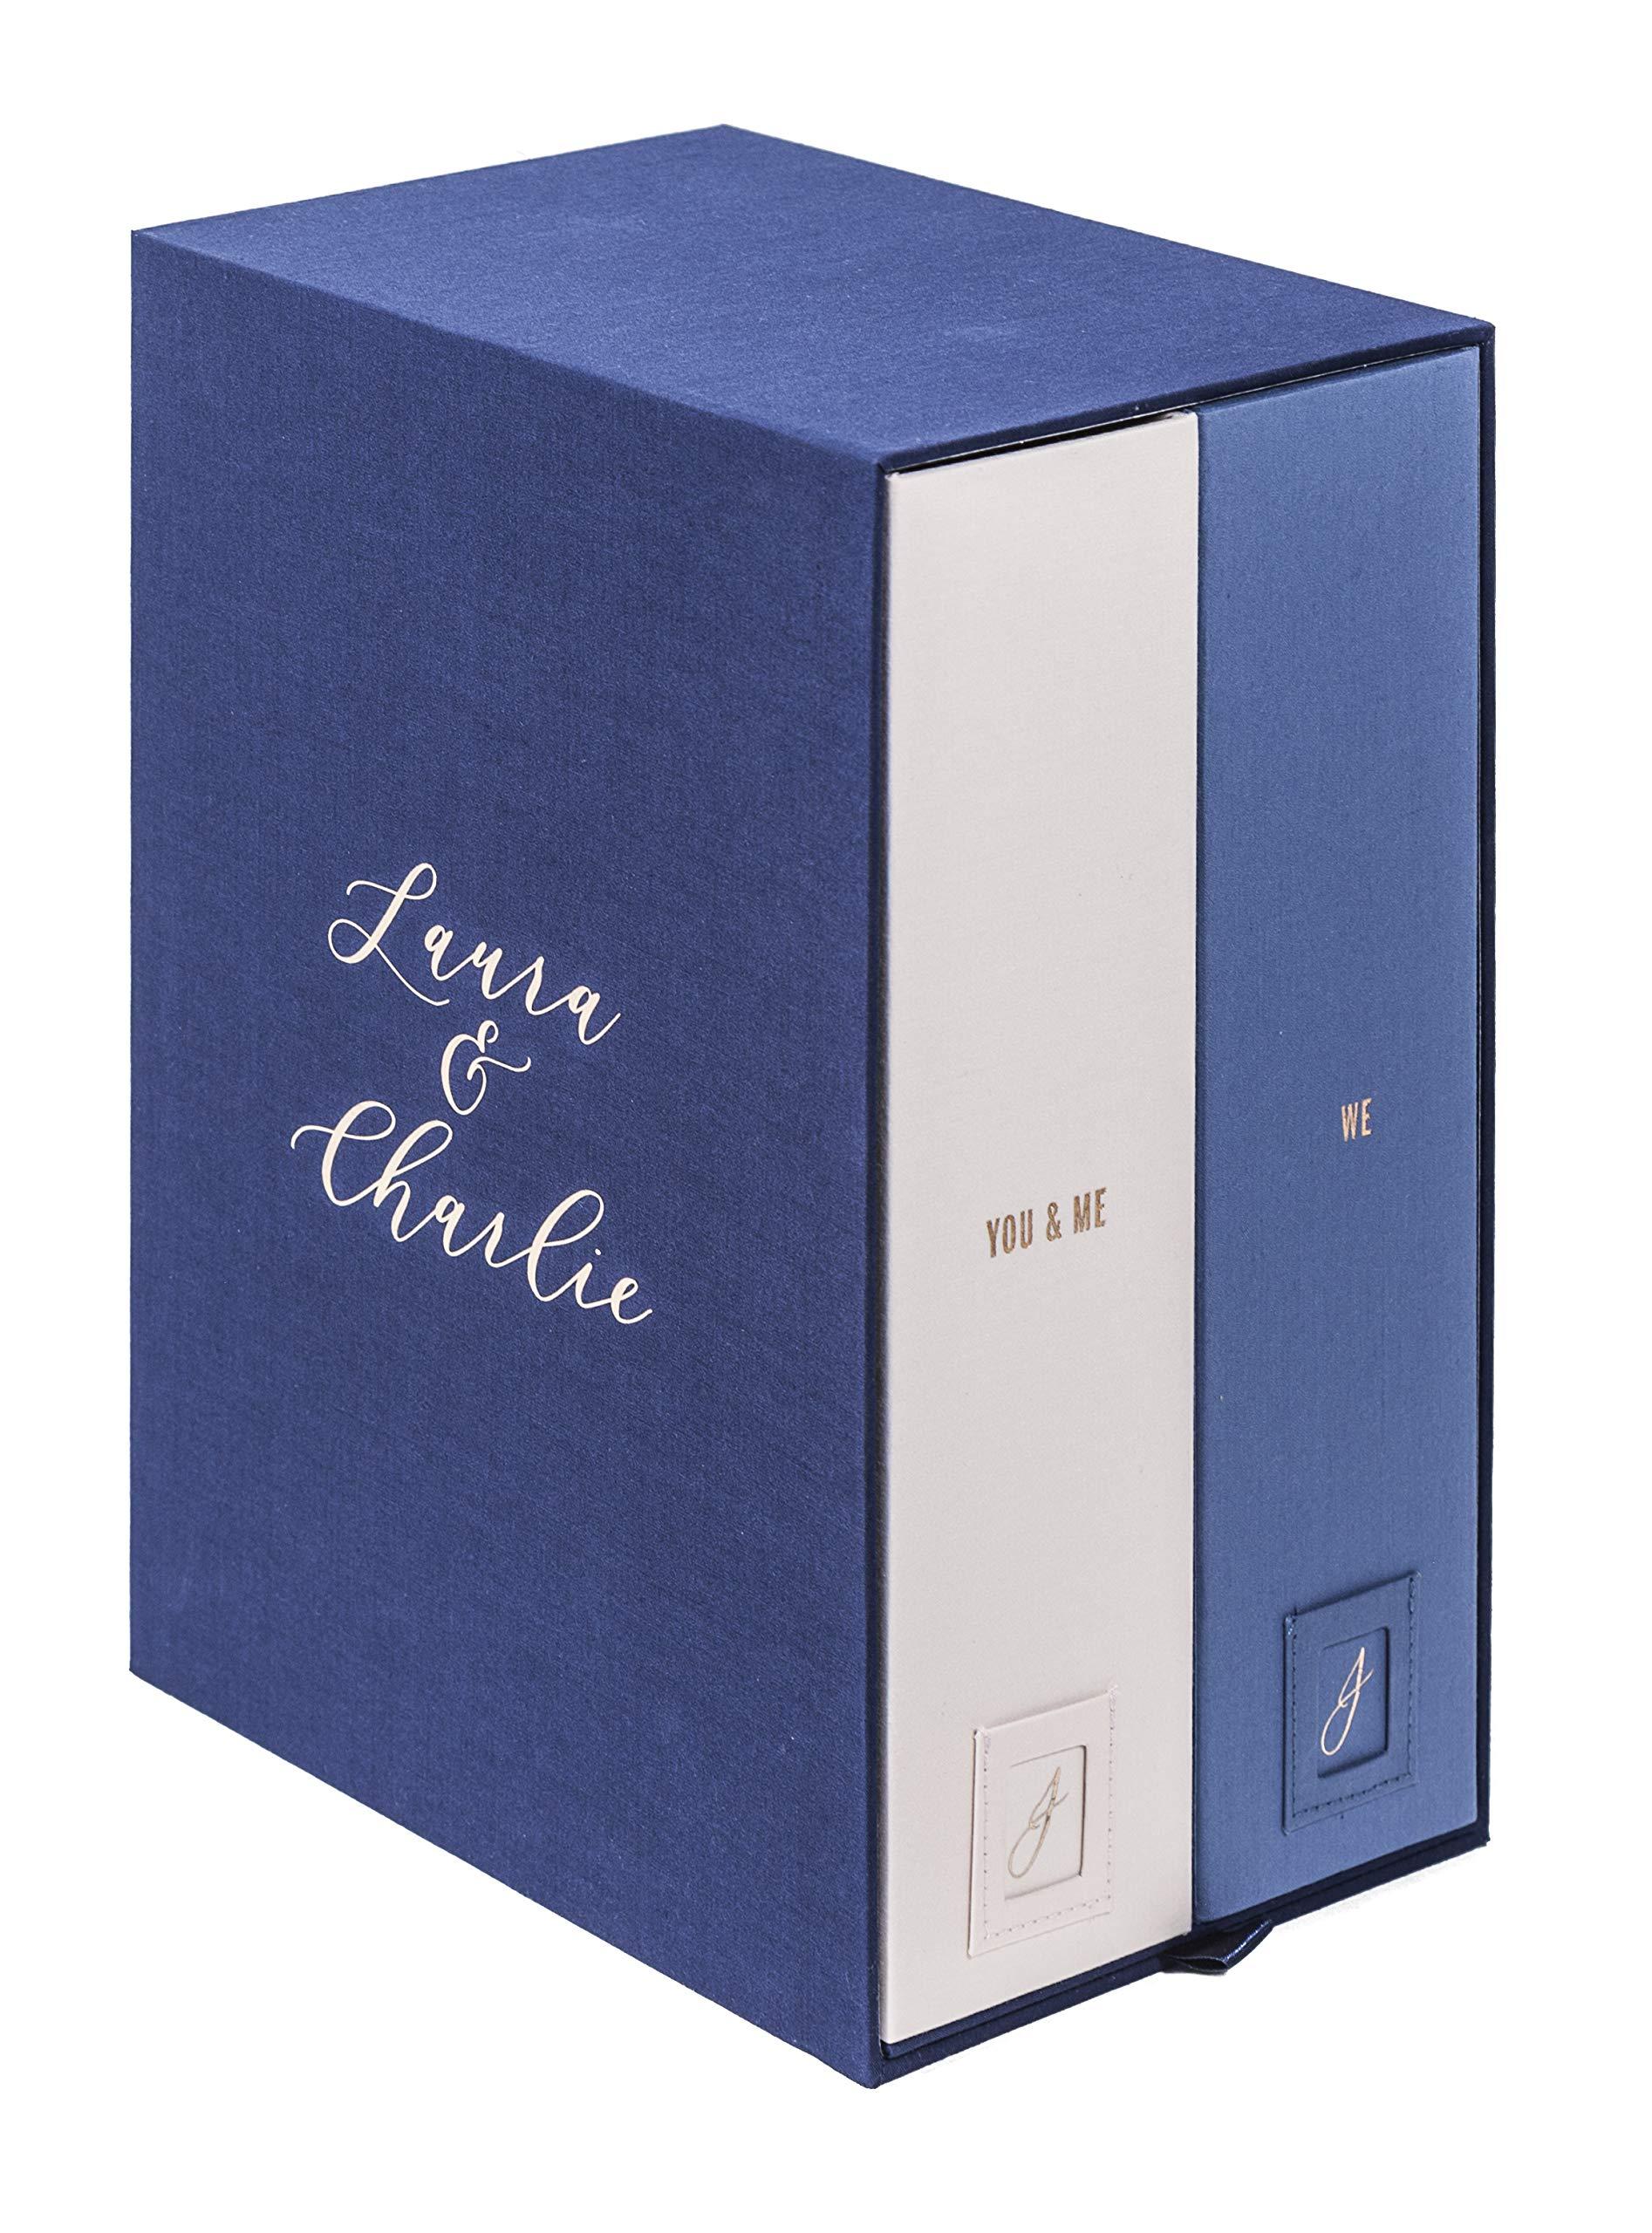 Handwritten Personalized Wedding Keepsake Box-Monogrammed Memory Box-Wedding Shower-Bridal Shower Gift-Engagement Gift-Anniversary Present-Couples Gift-Handmade-Wedding Album-Wedding Card Box-Bl-Laura by Savor